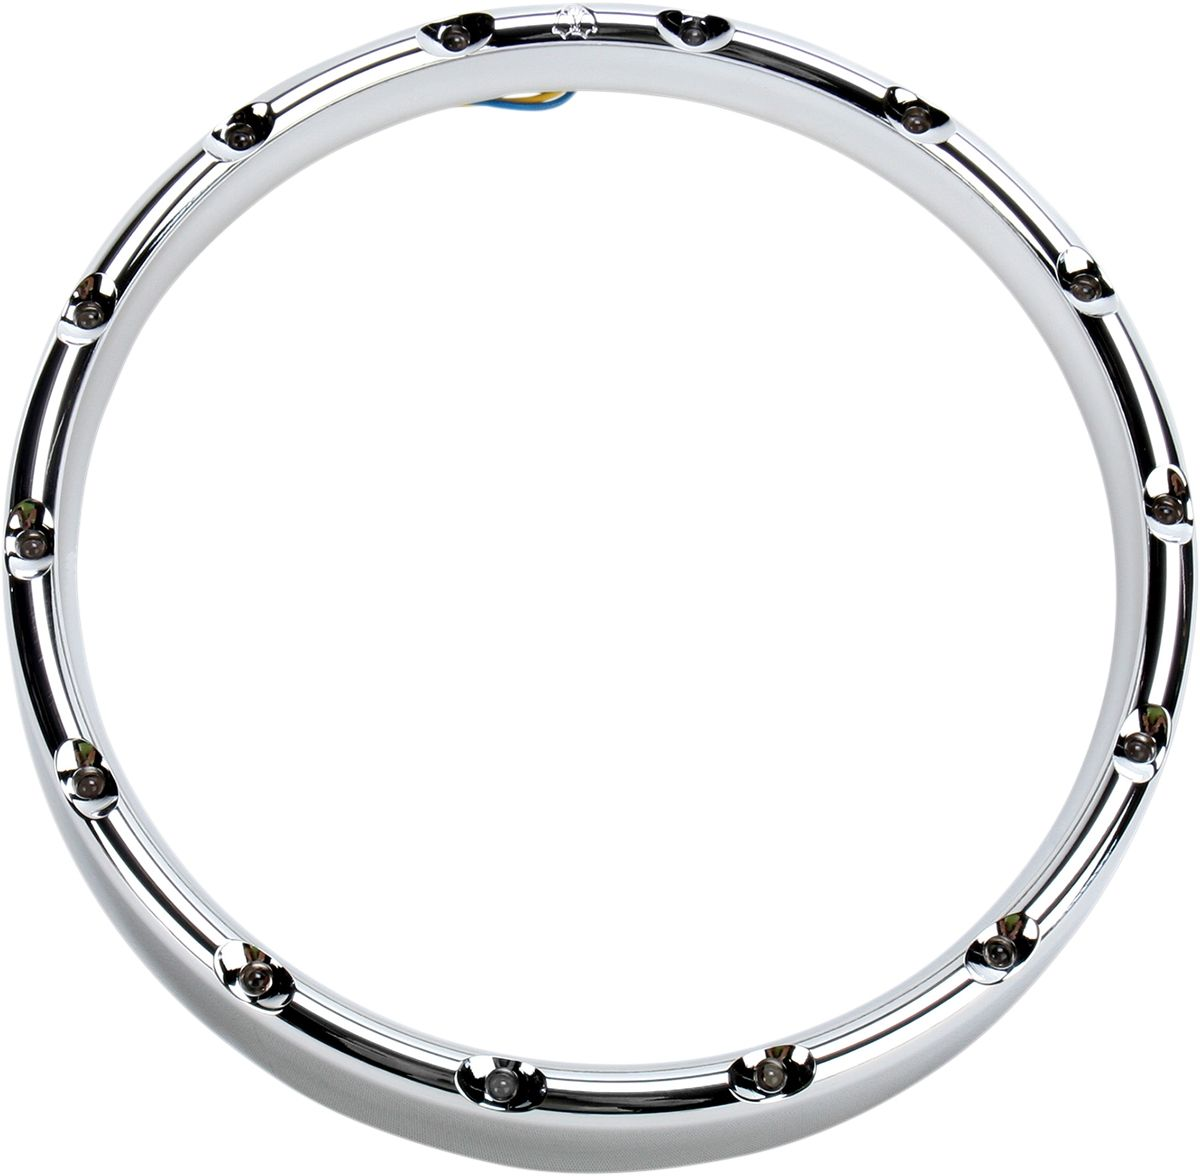 【ARLEN NESS】頭燈飾環 FLST CHR [2001-0576] - 「Webike-摩托百貨」